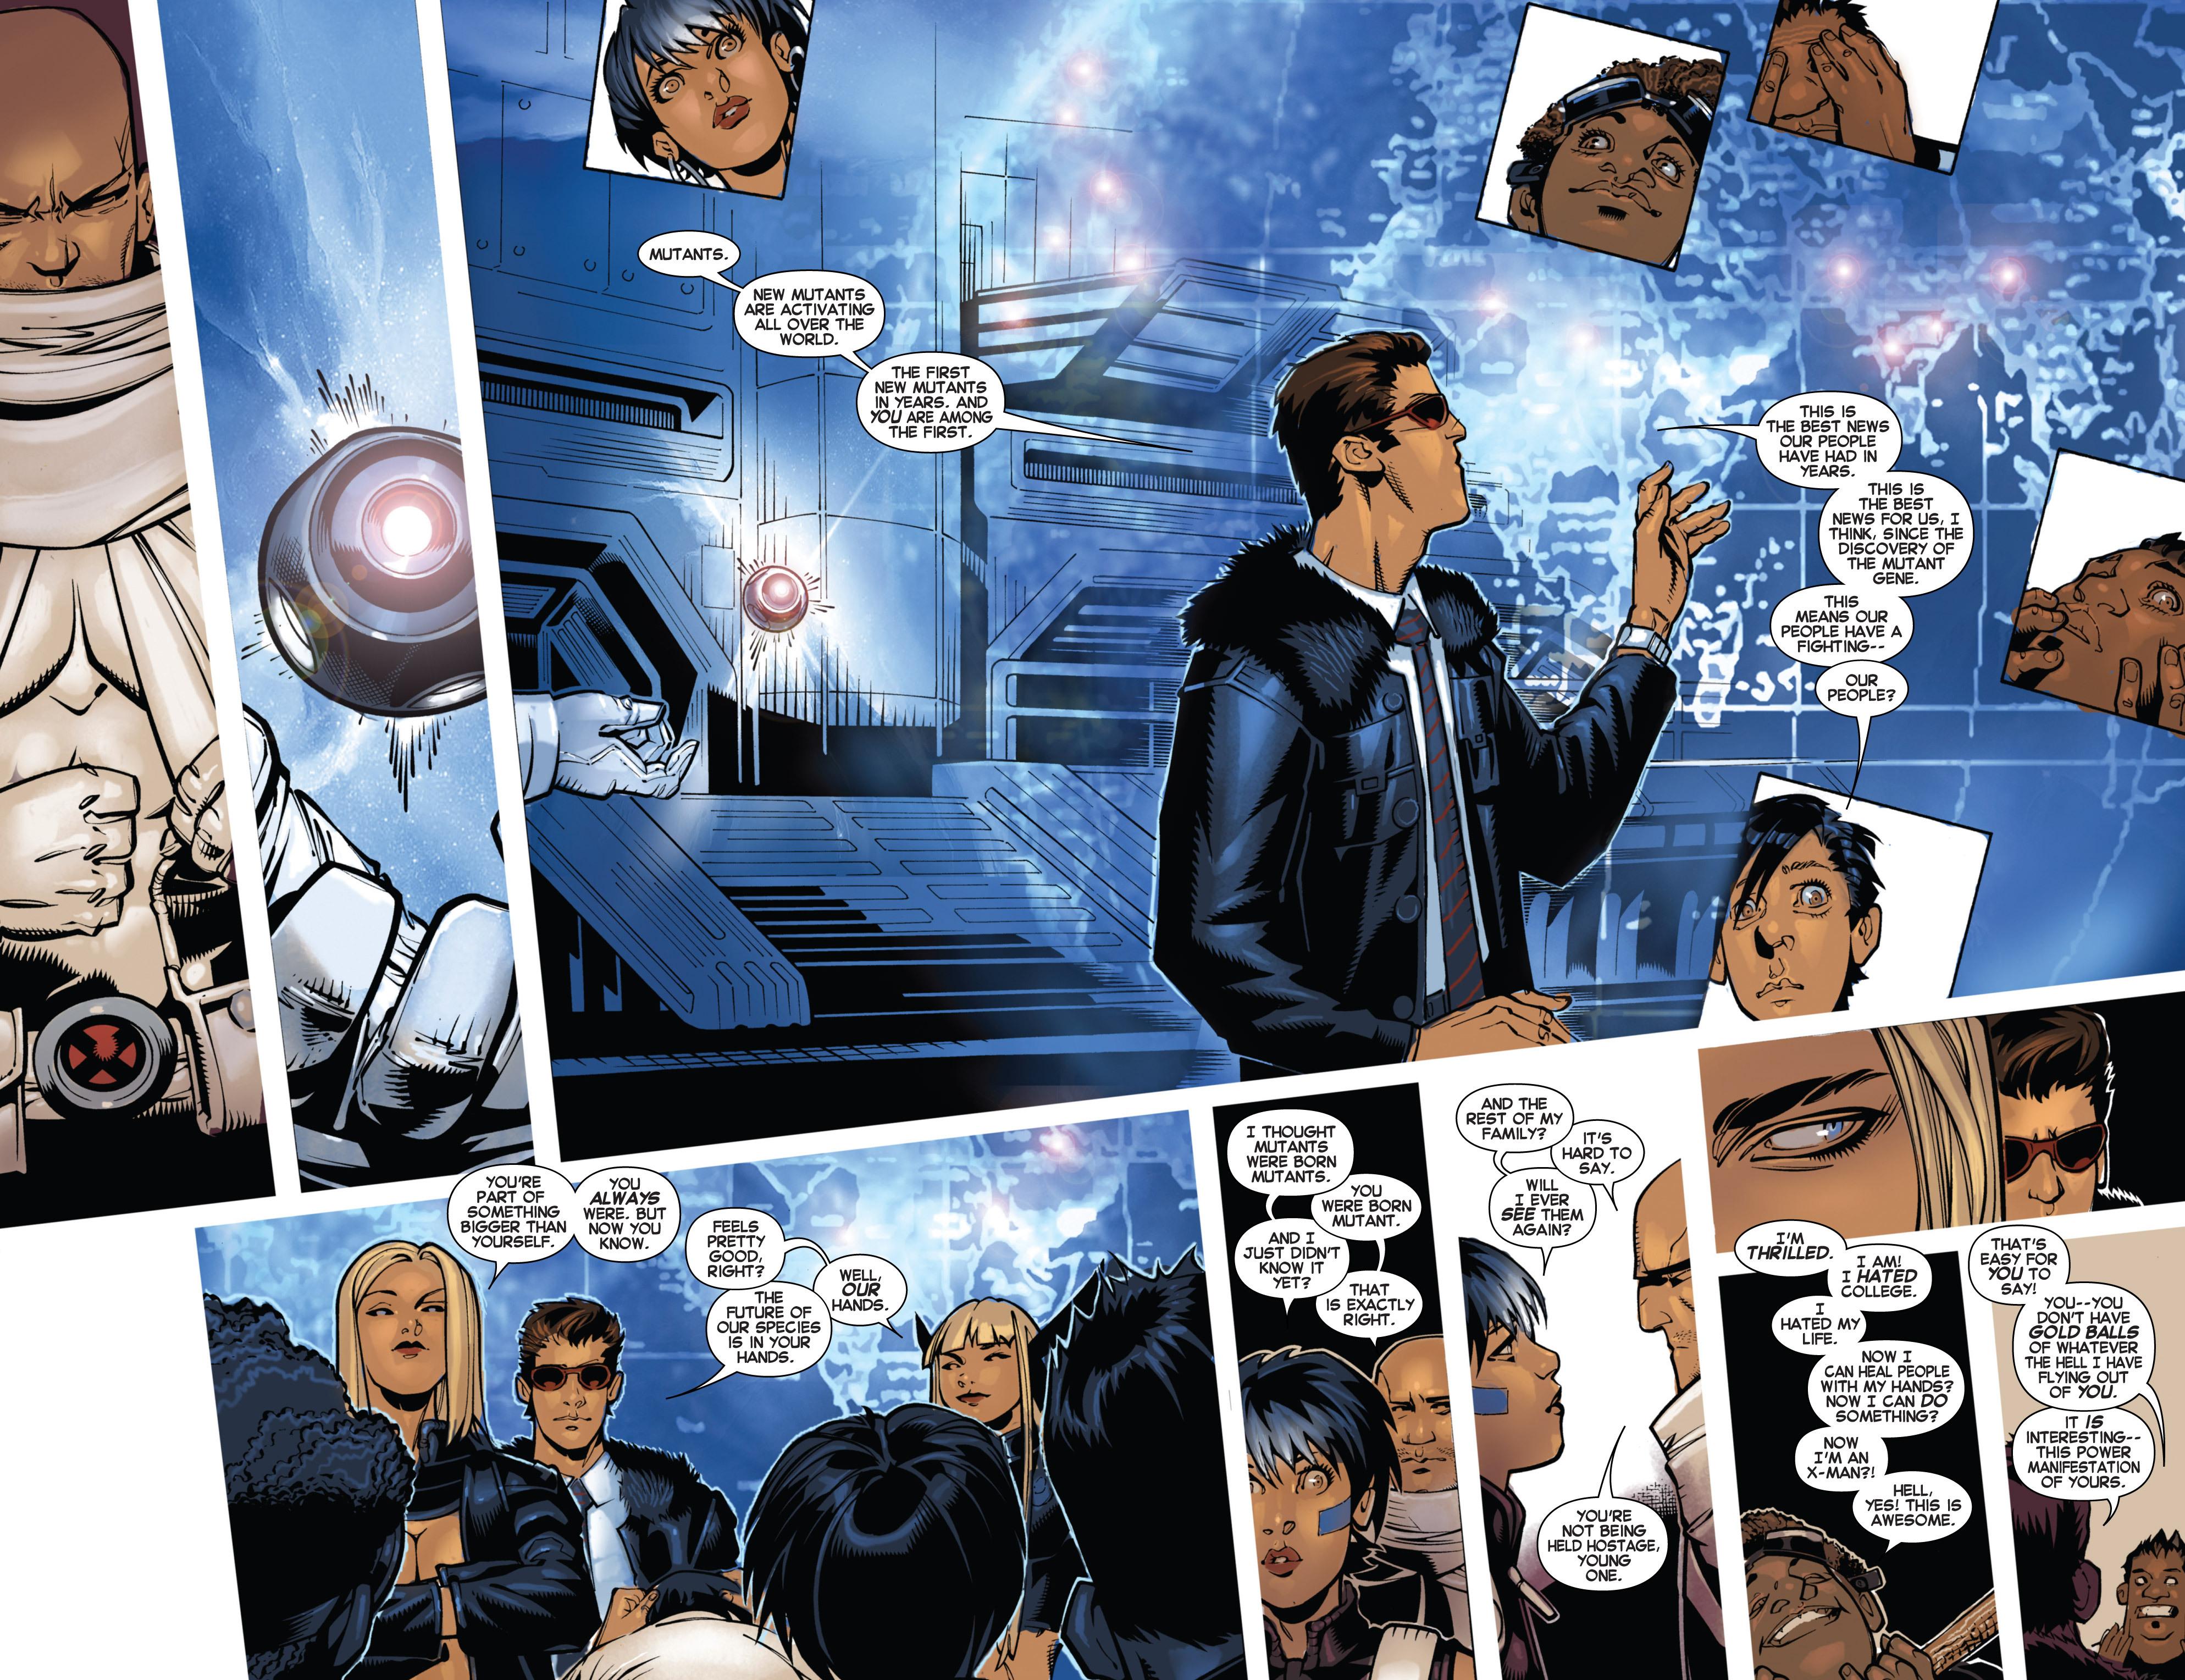 Read online Uncanny X-Men (2013) comic -  Issue # _TPB 1 - Revolution - 35